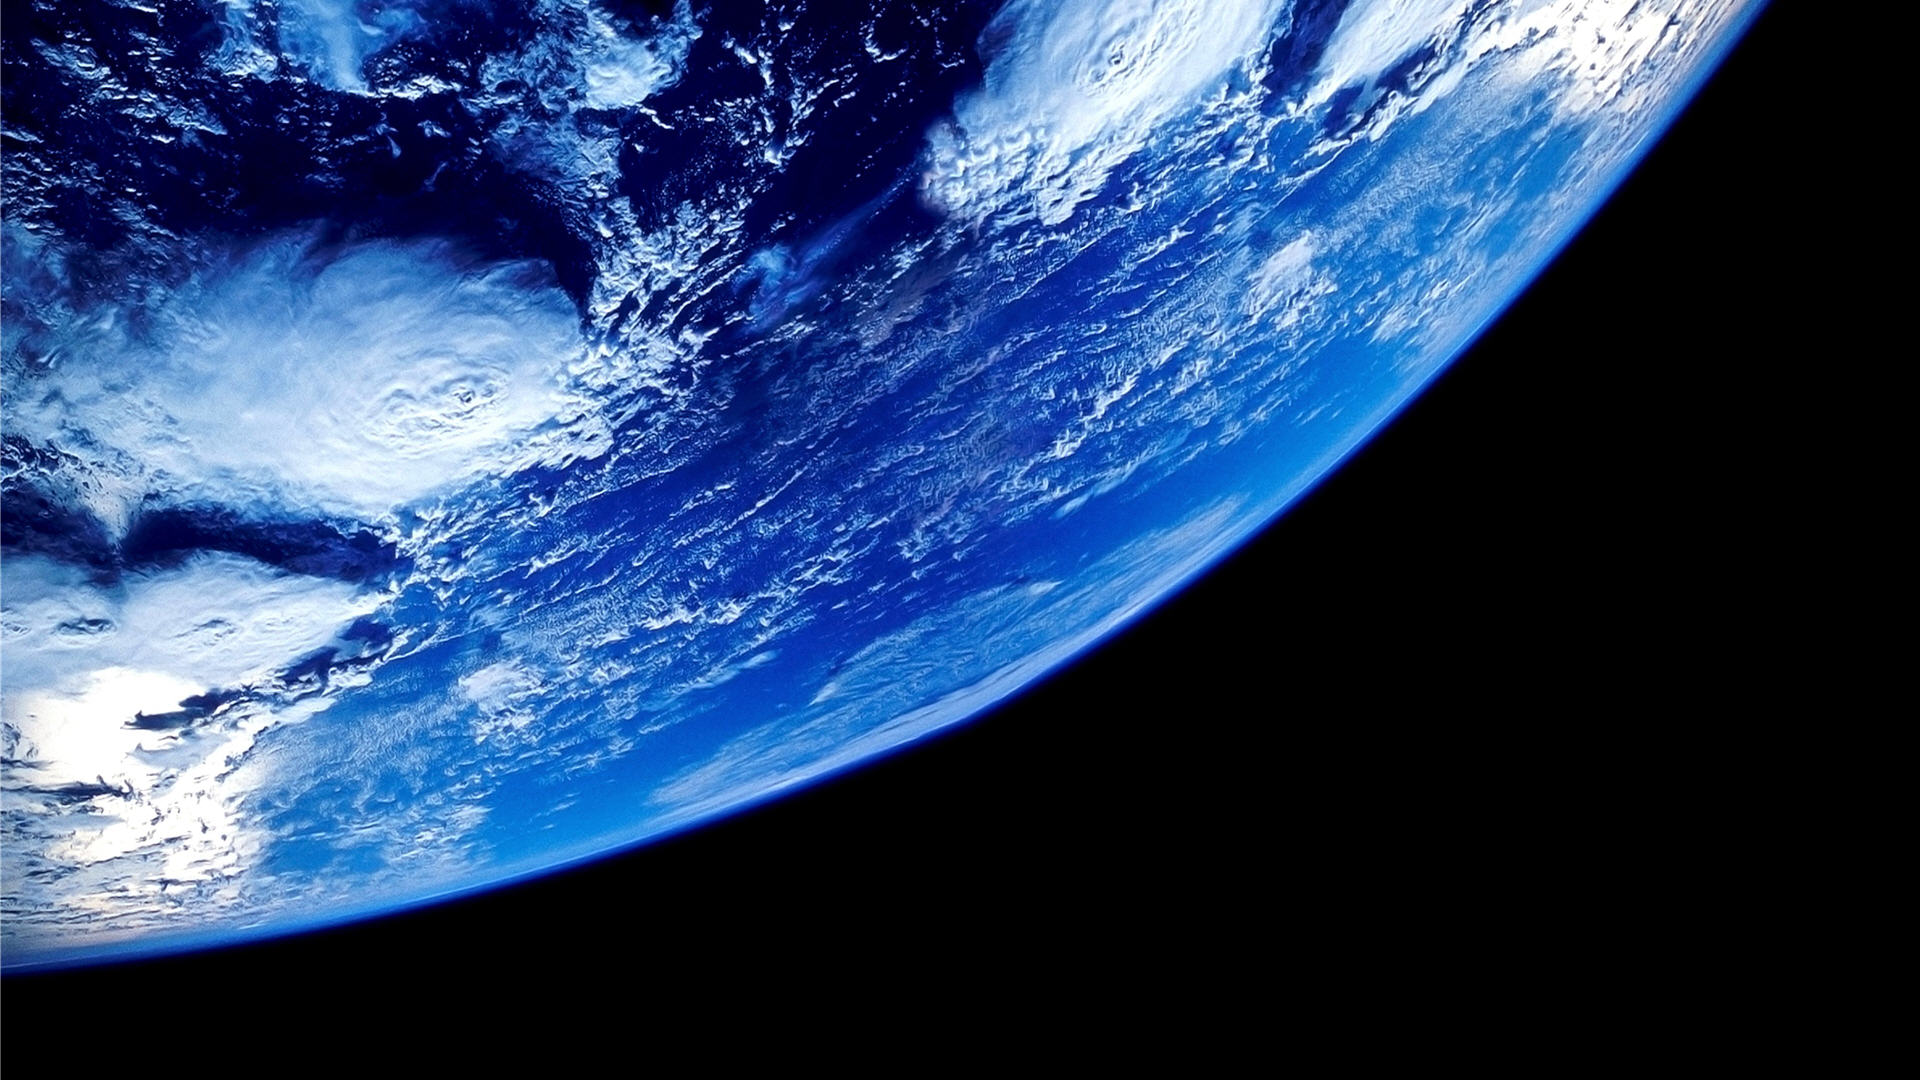 Nasa Earth Wallpaper HD 1920x1080 5152 1920x1080